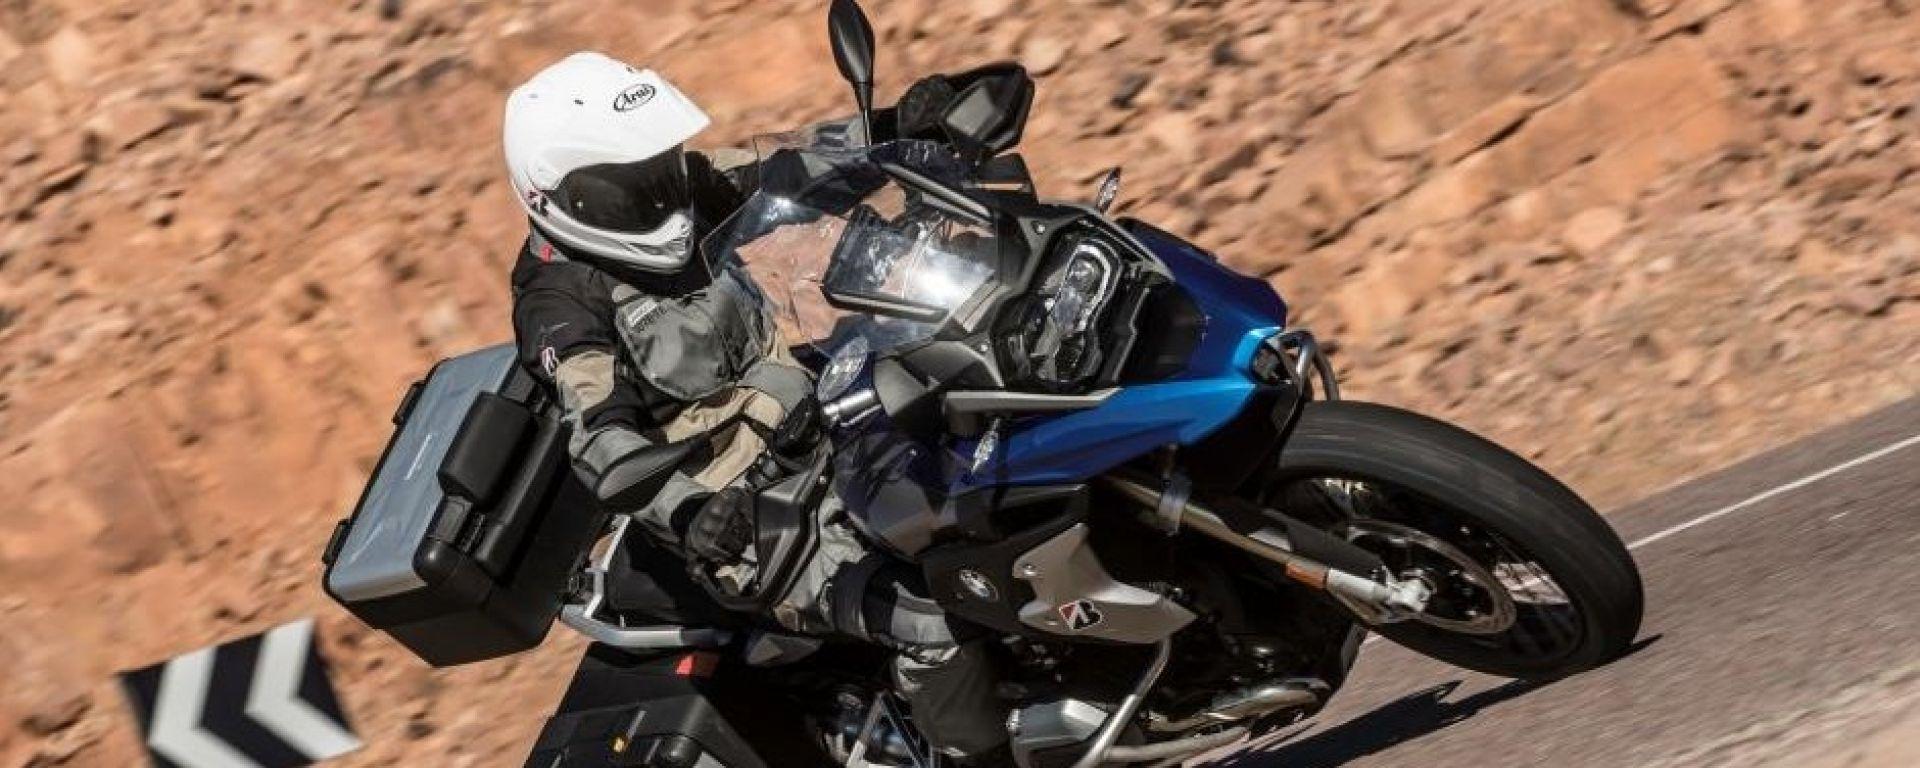 Bridgestone Battlax Adventure A41 per BMW R1200GS